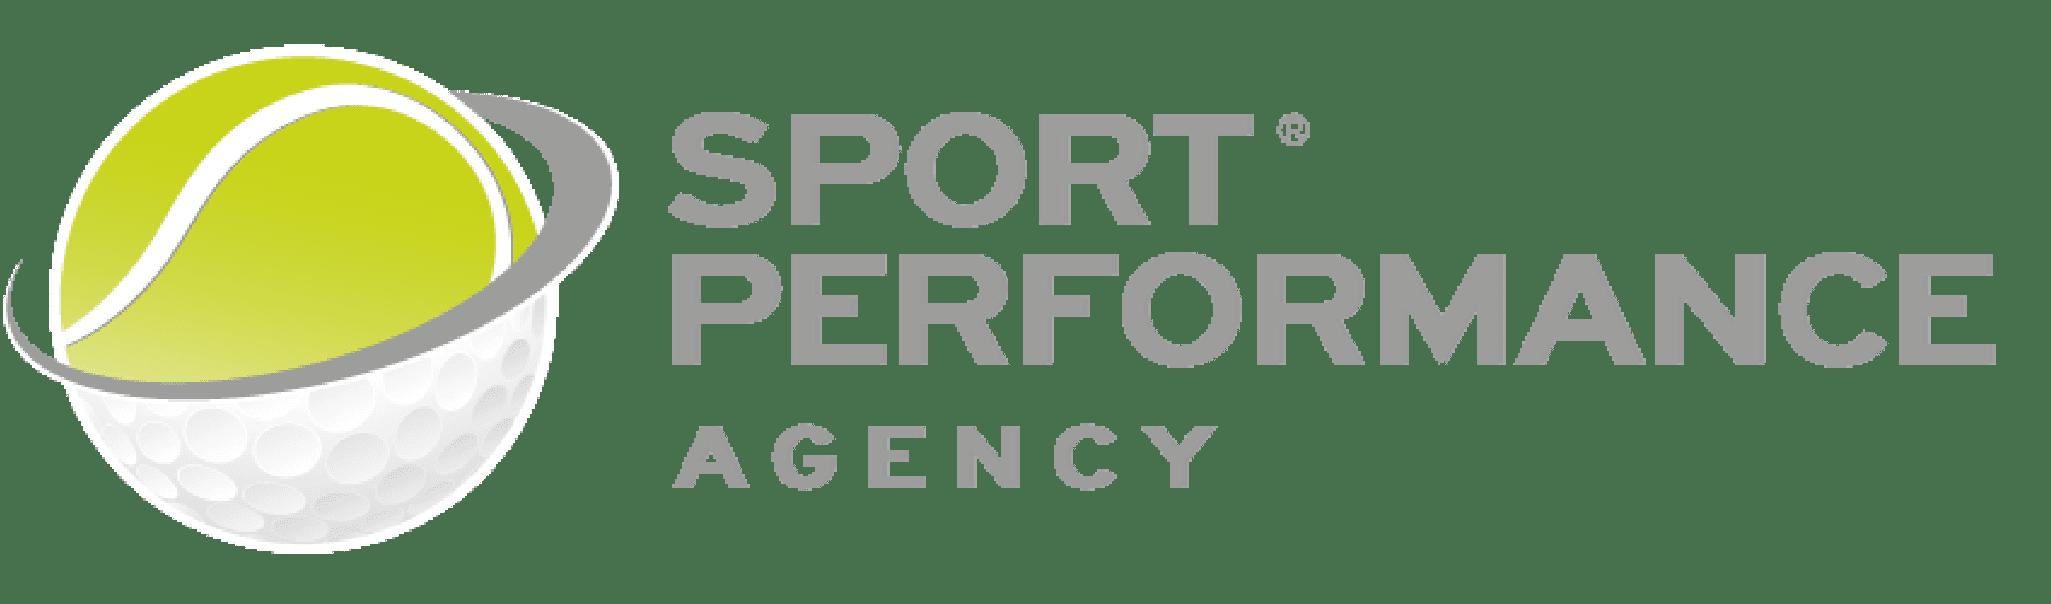 Sport Performance Agency